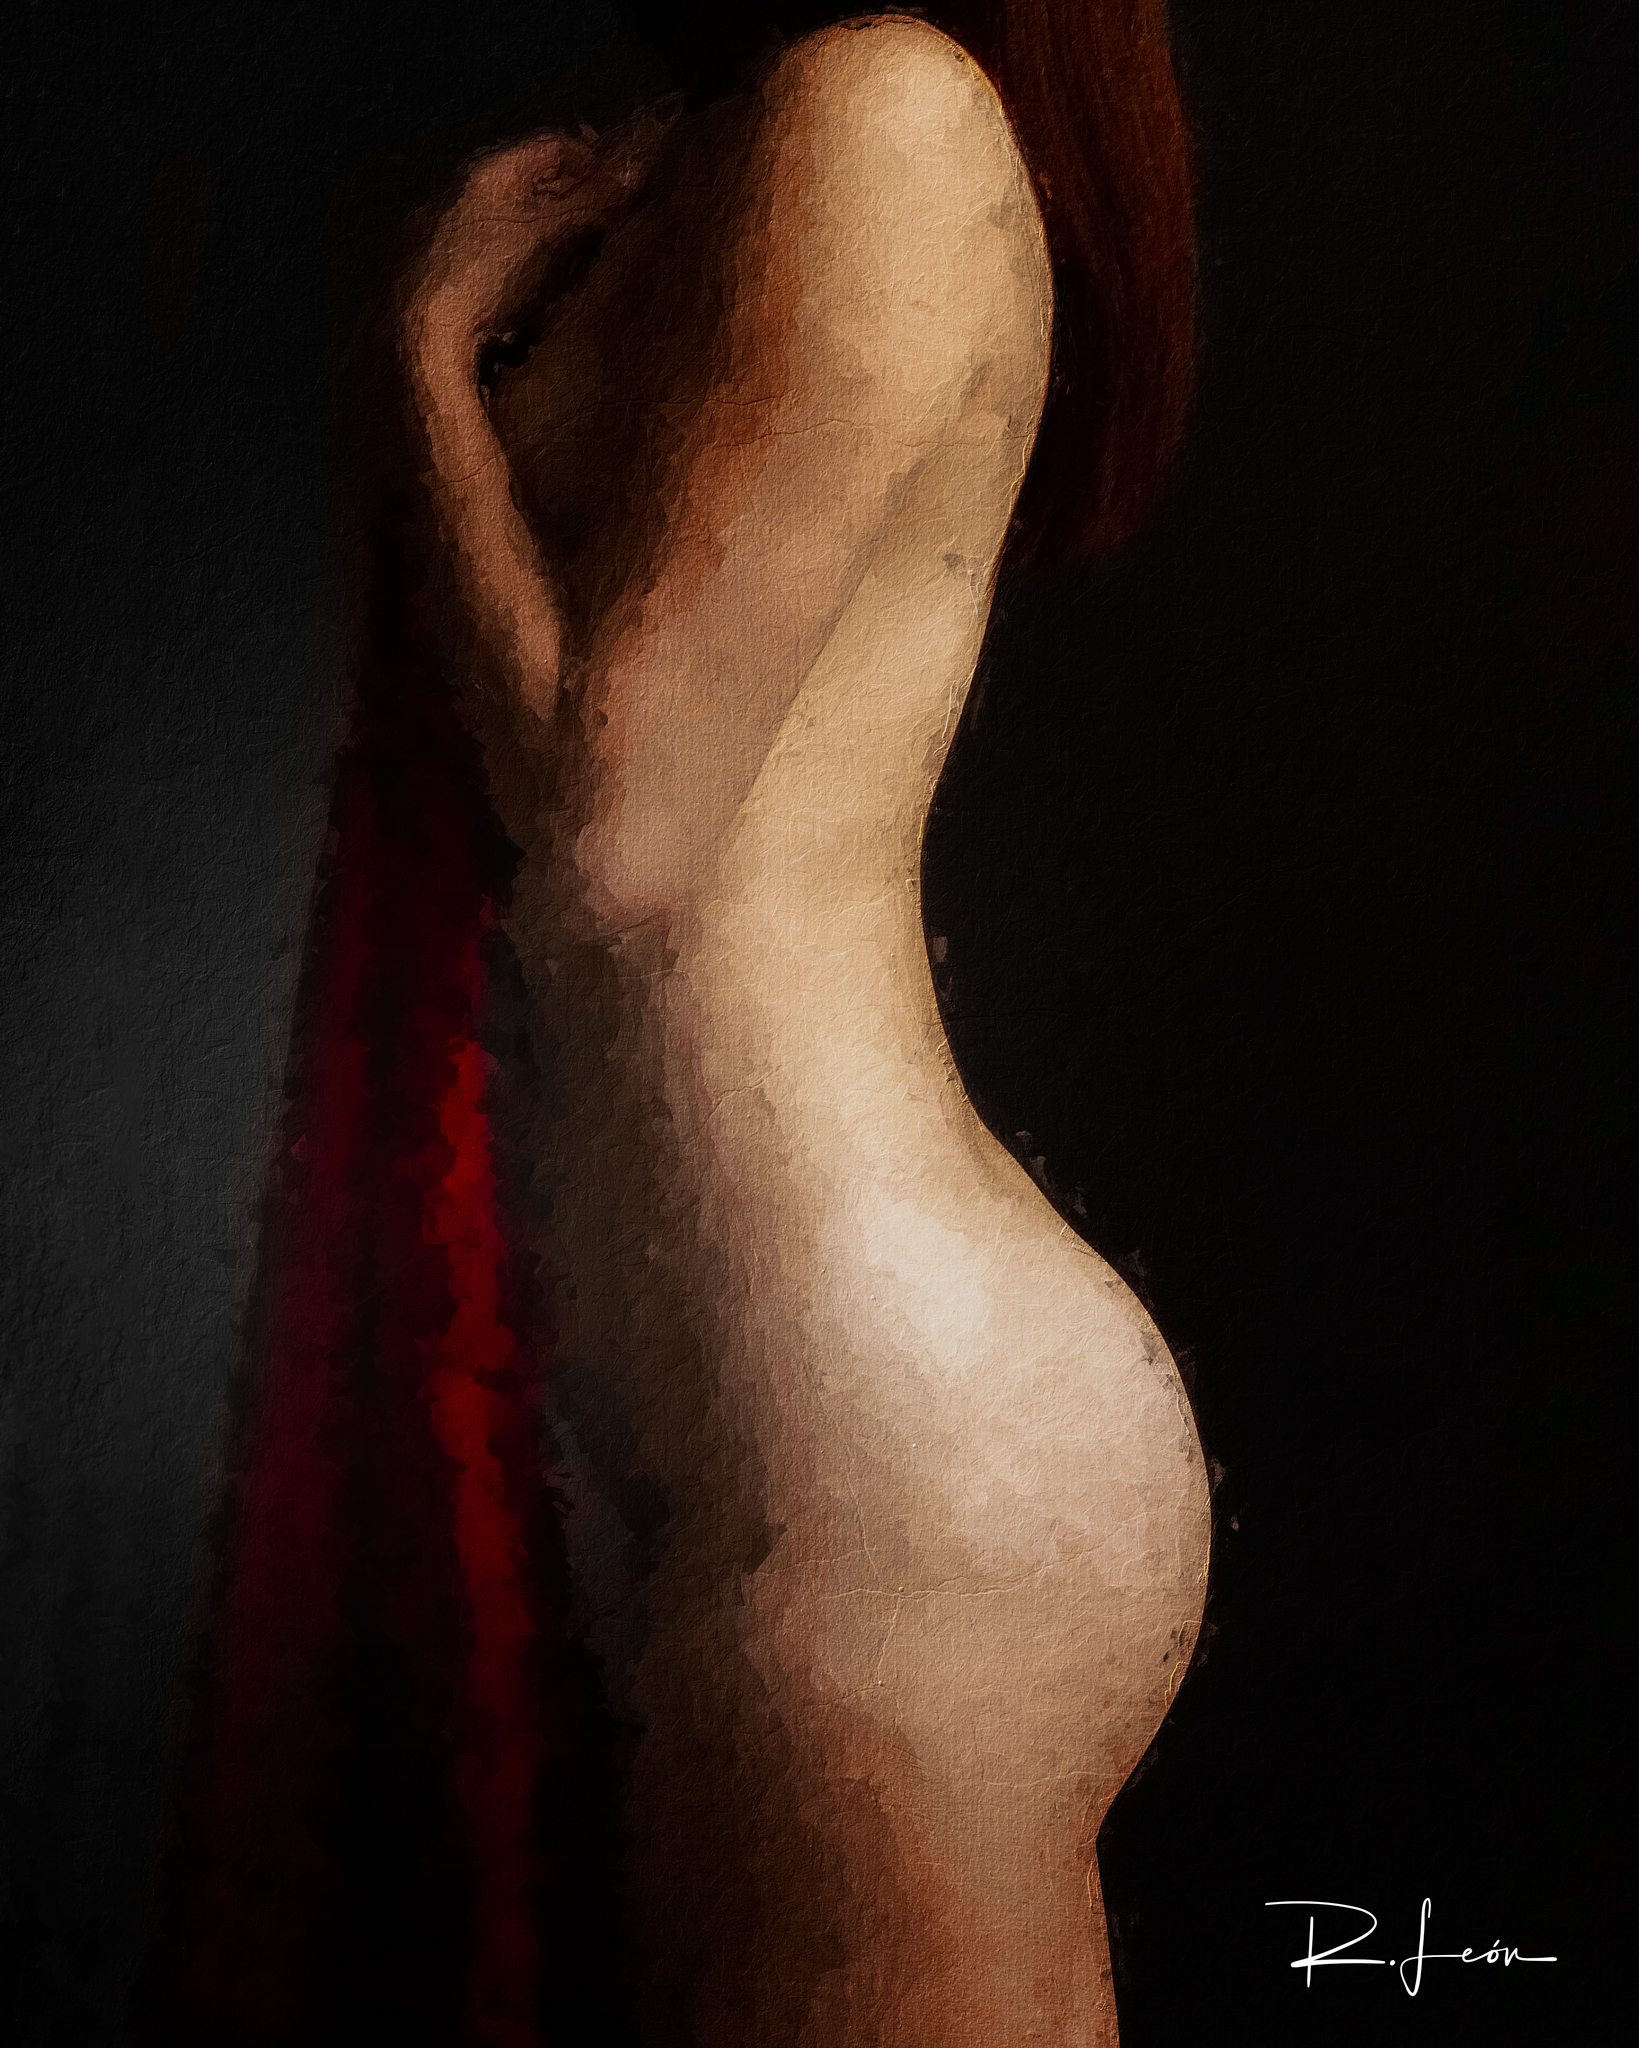 Mujer-al-óleo_02